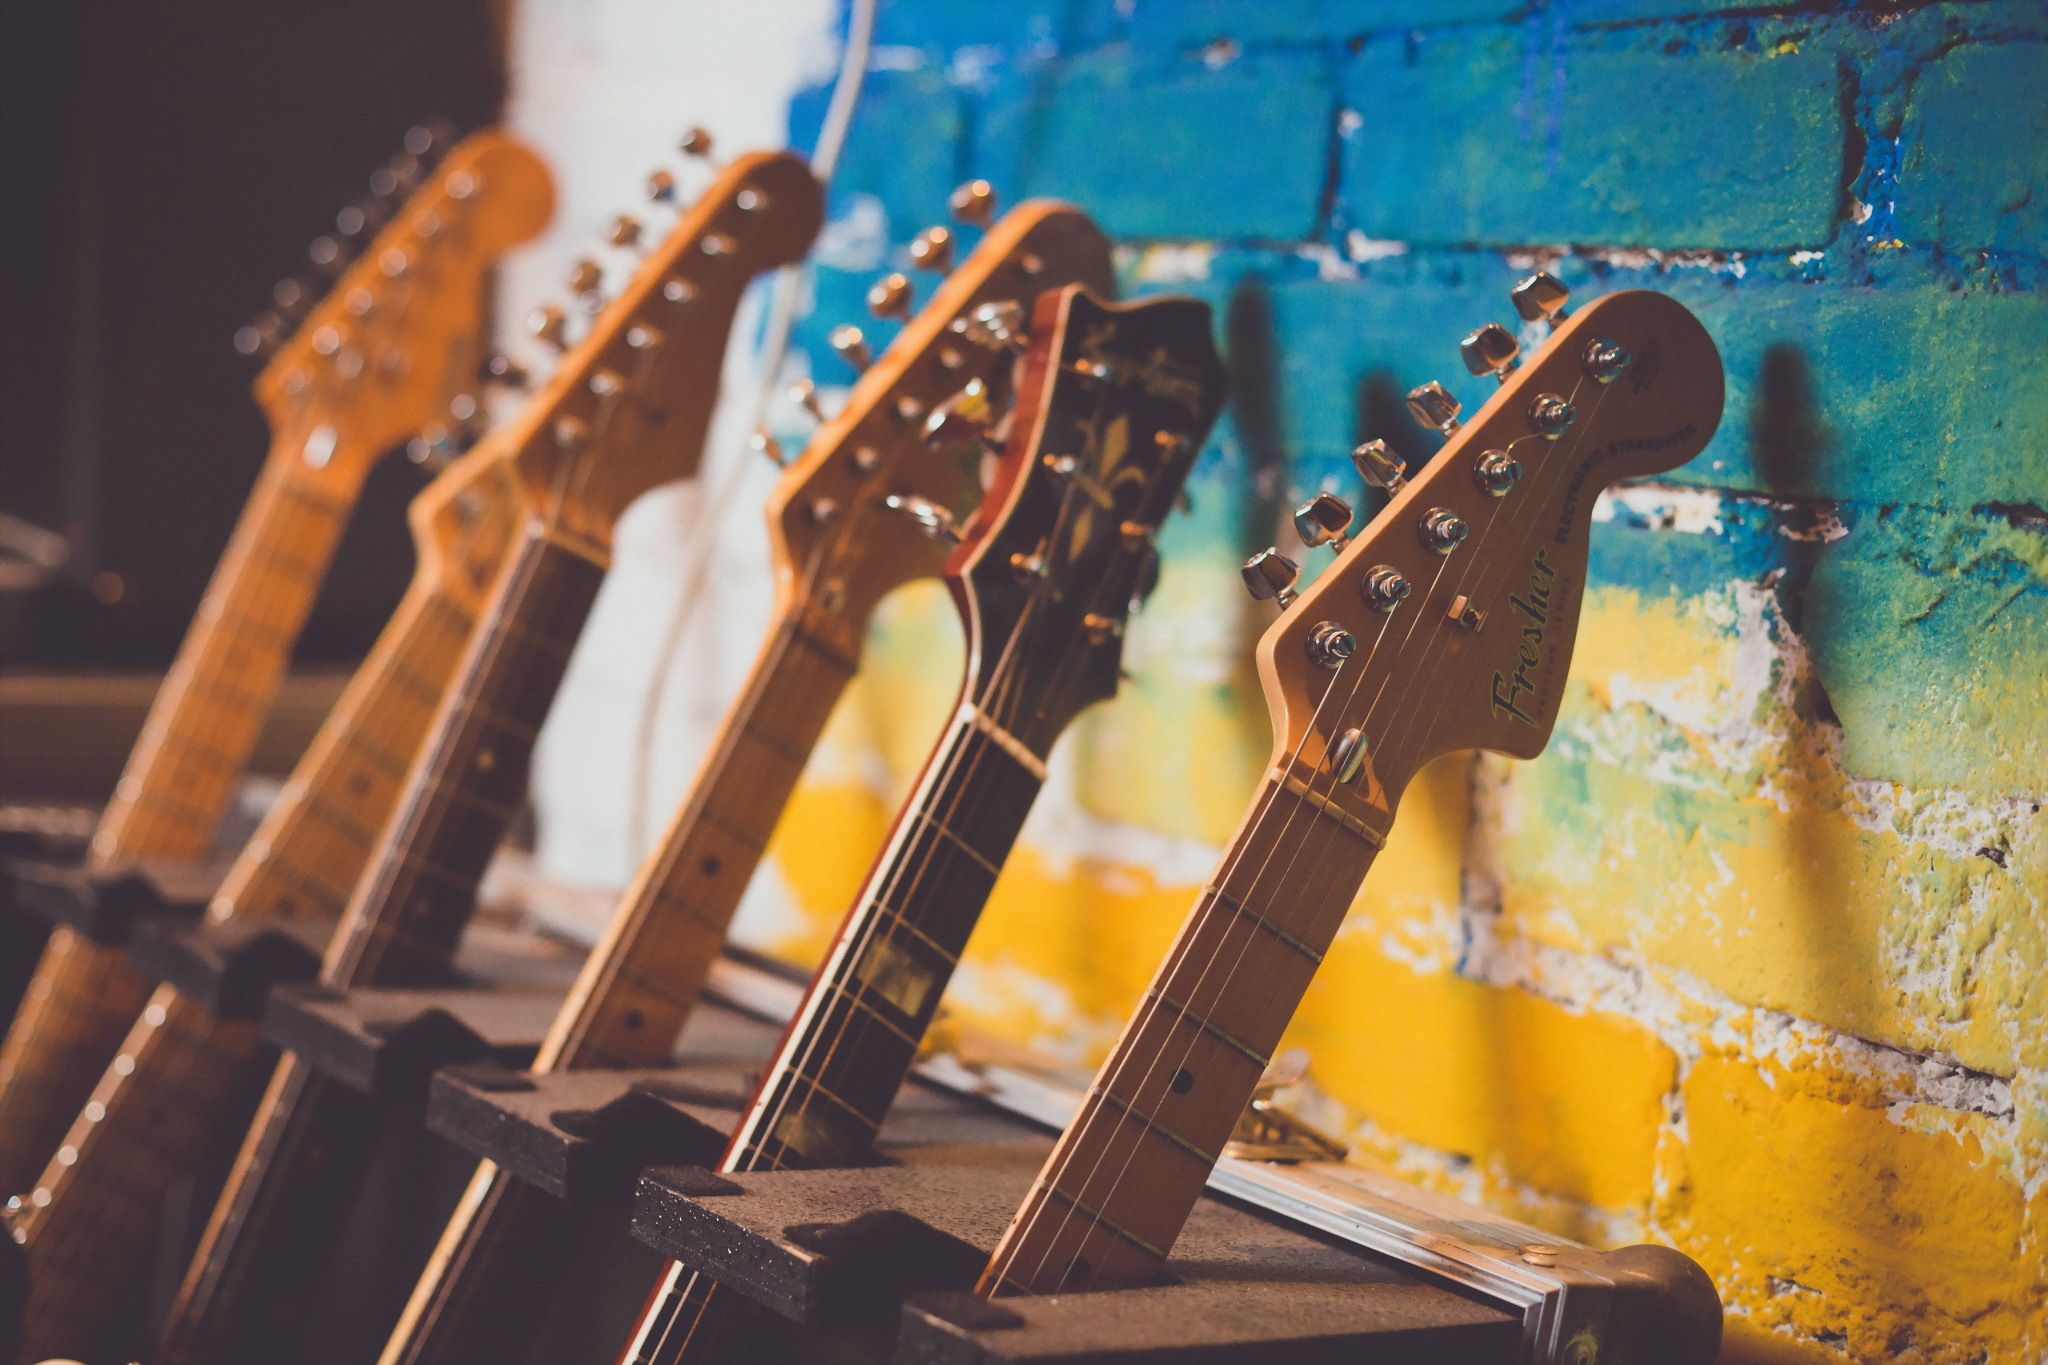 Guitare Full HD Fond d'écran and Arrière-Plan | 2048x1365 | ID:572183